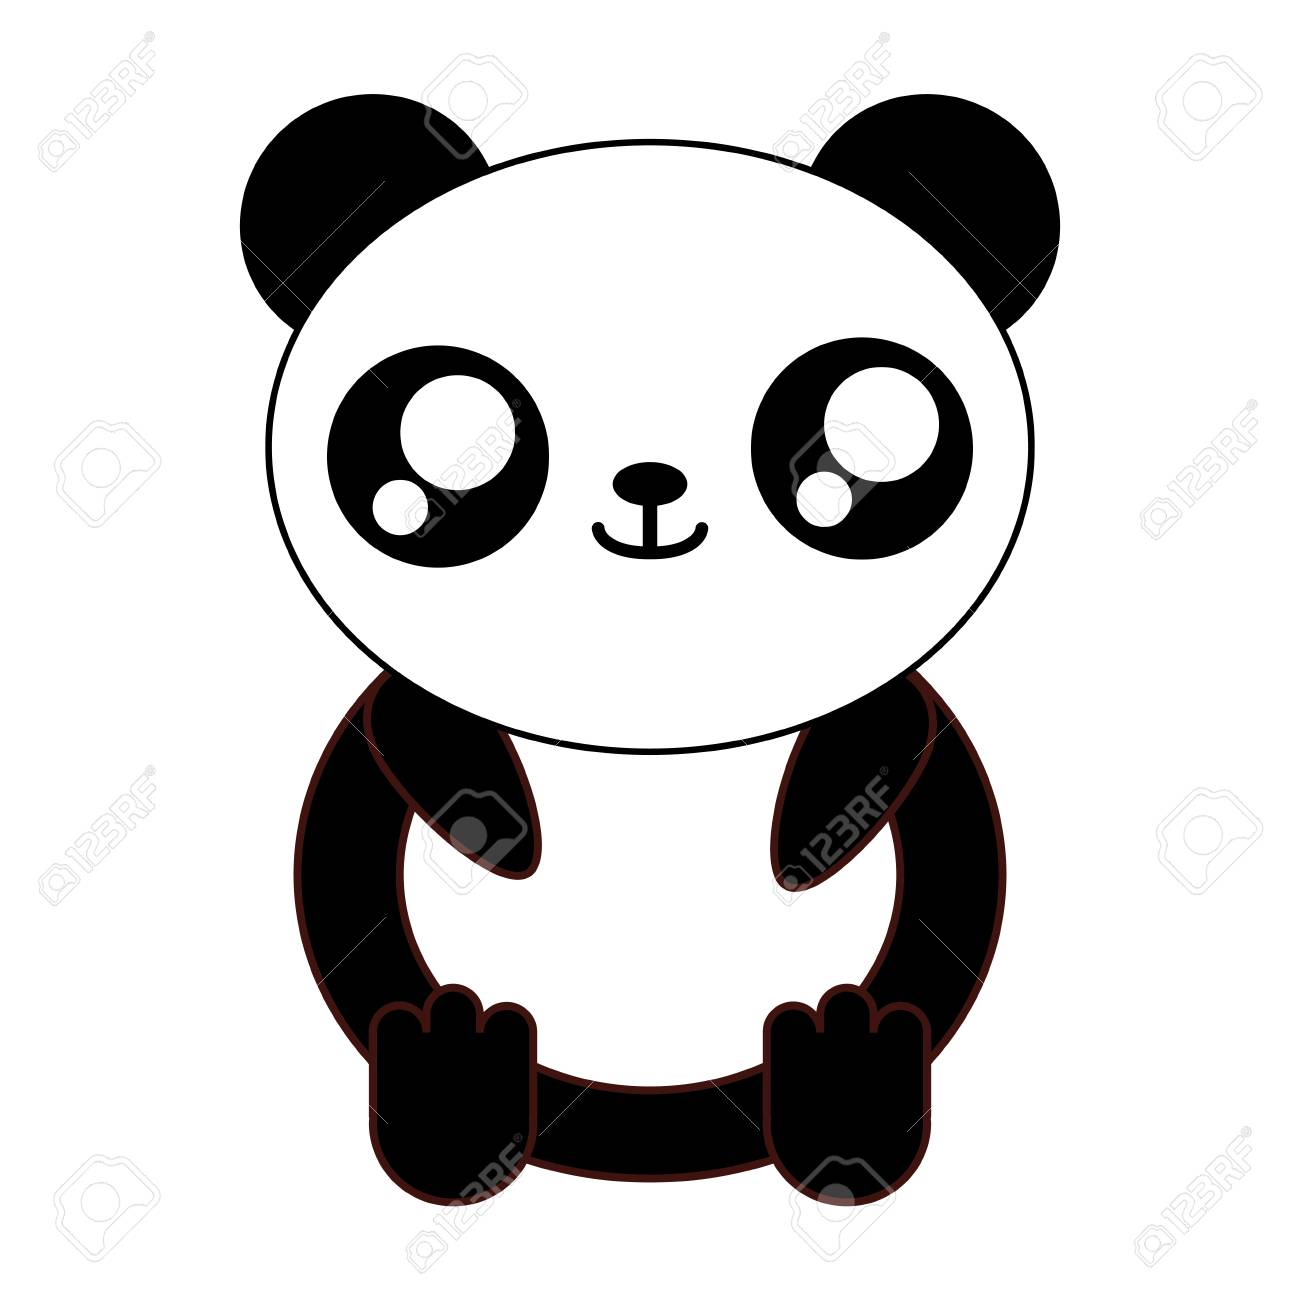 Kawaii Panda Profile Picture